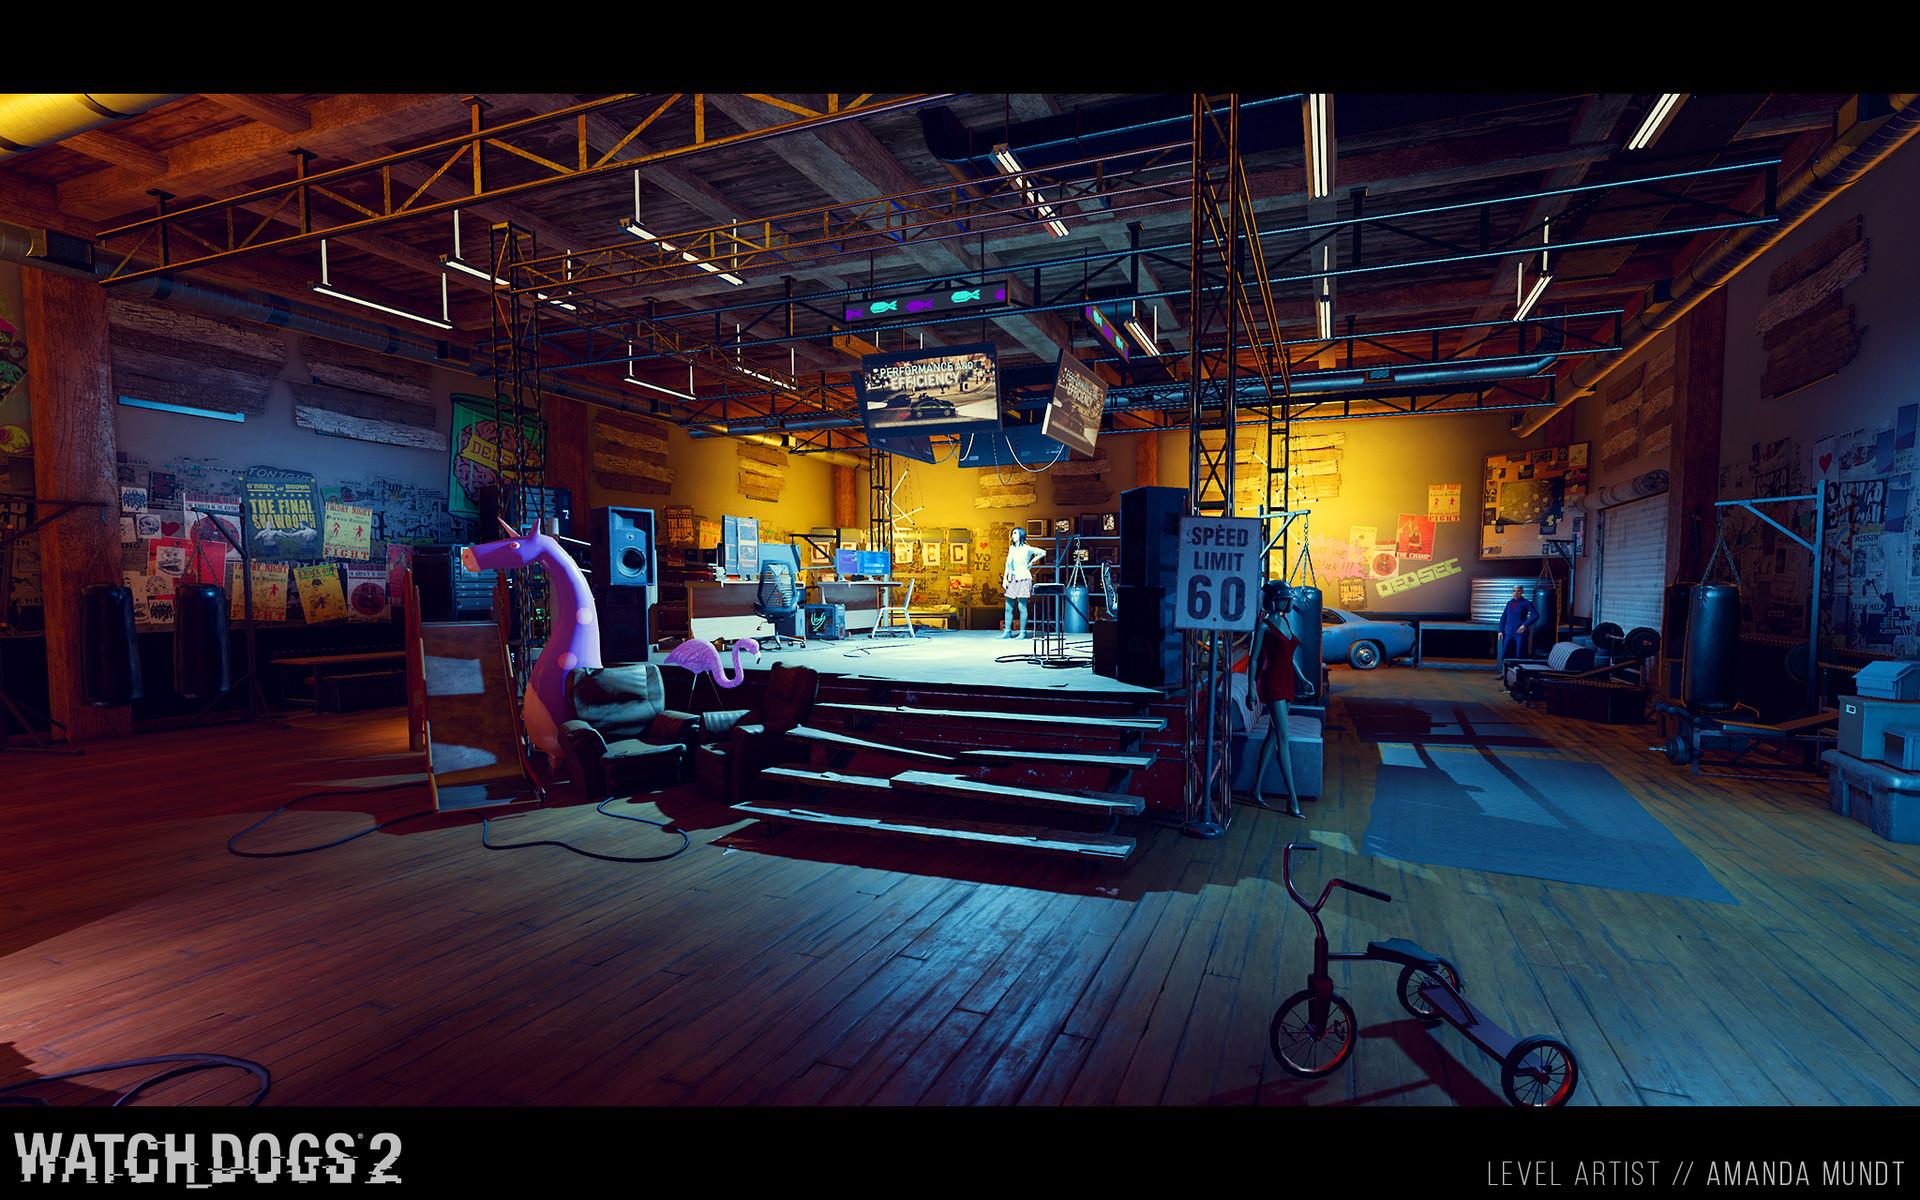 Amanda Mundt Watch Dogs 2 Hacker Spaces